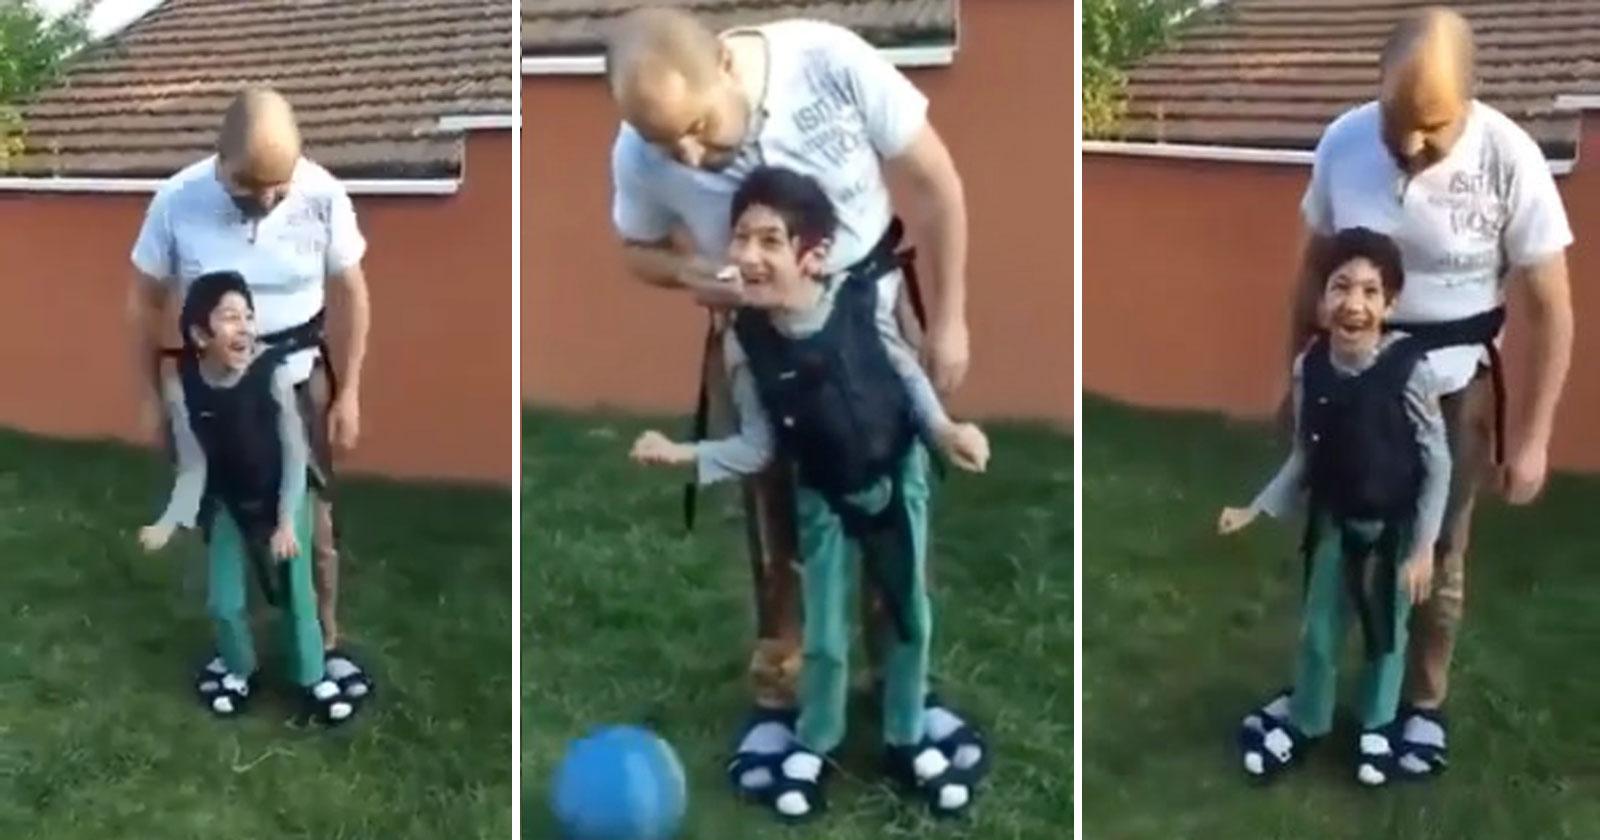 pai jogando futebol filho paralisia